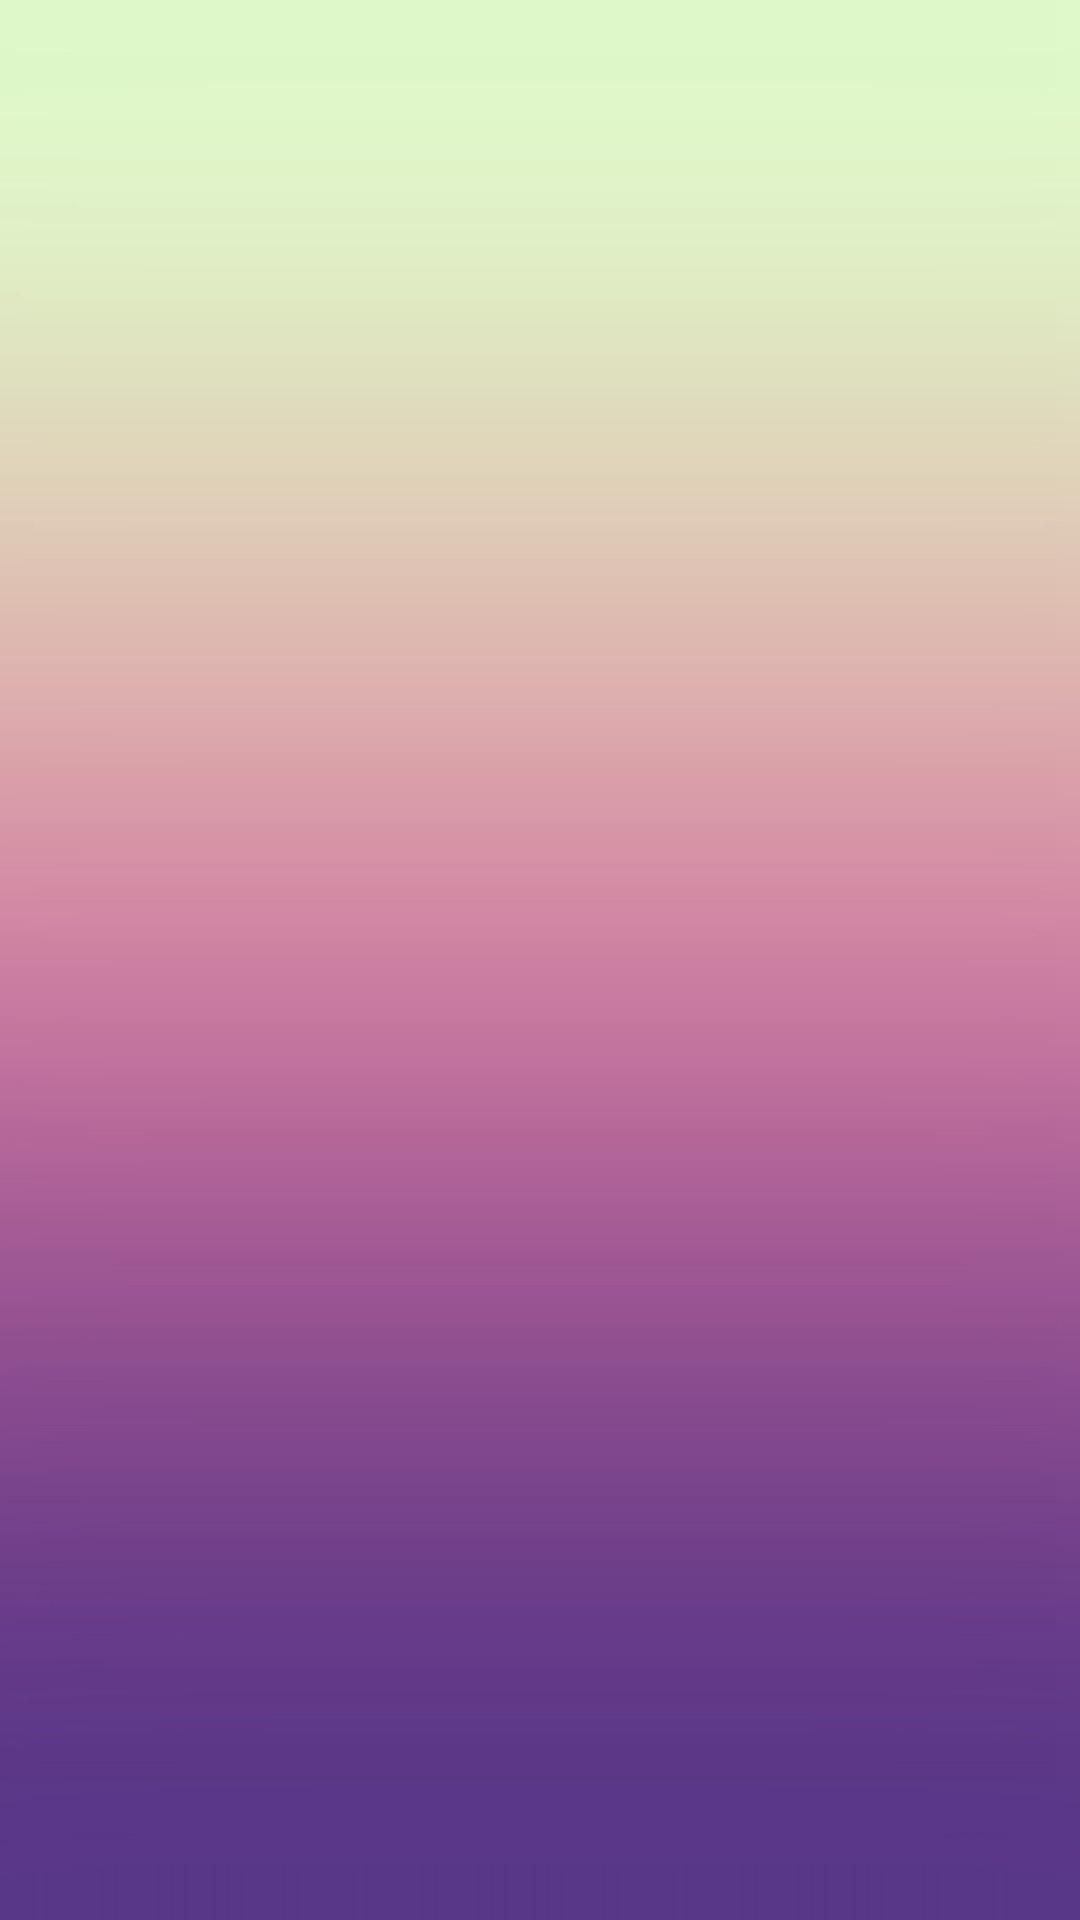 Purple Soft Red Gradation Blur iPhone 8 wallpaper